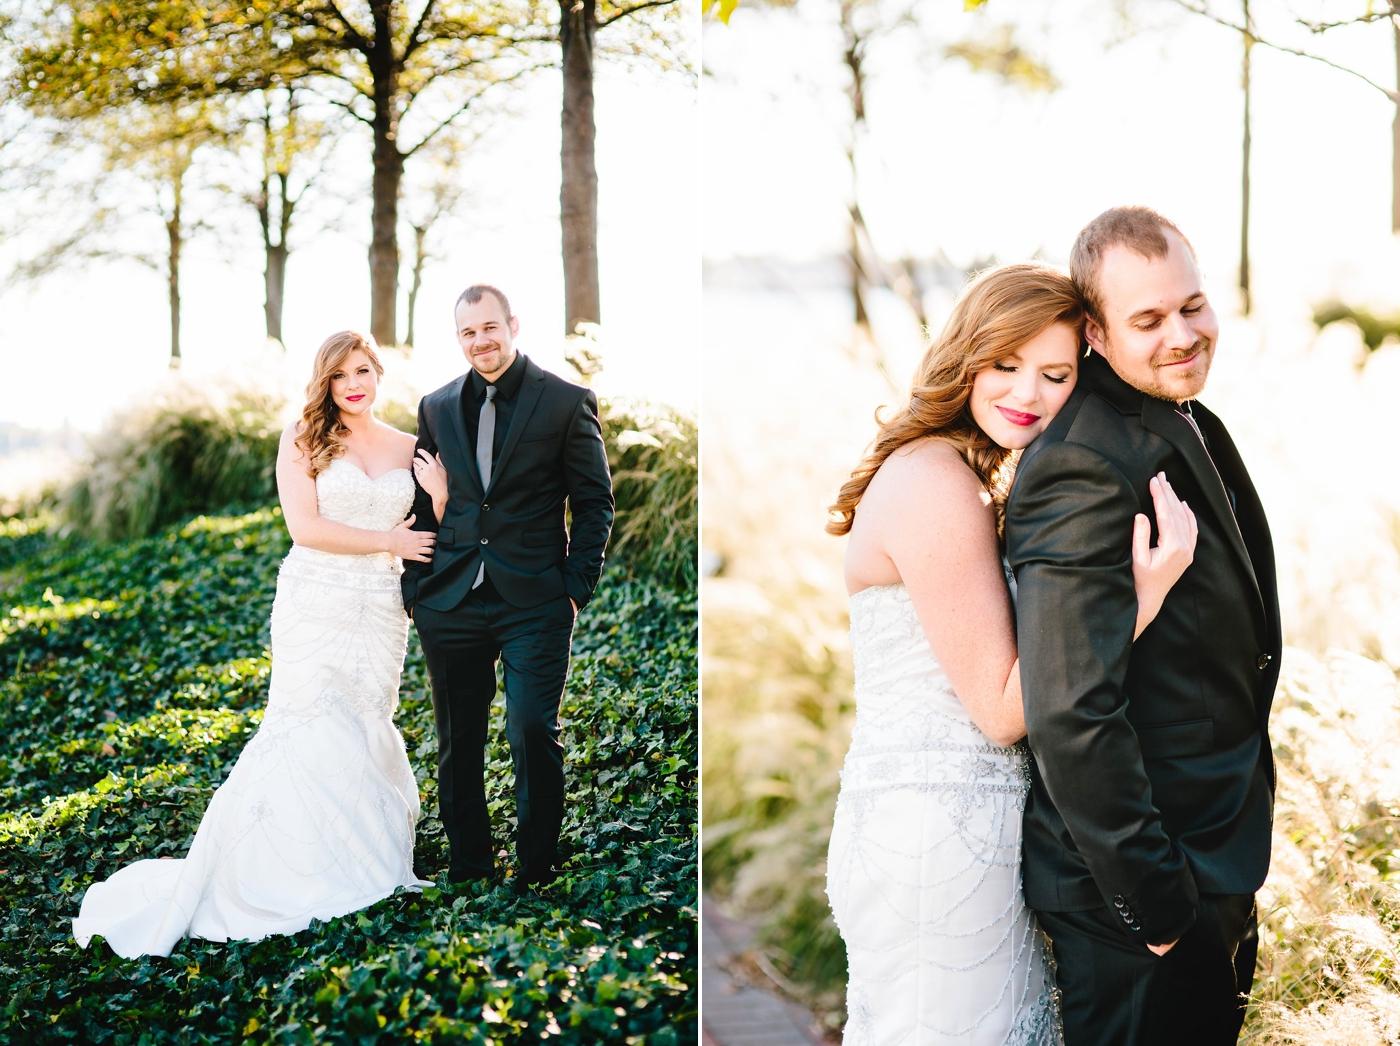 chicago-fine-art-wedding-photography-burnette11